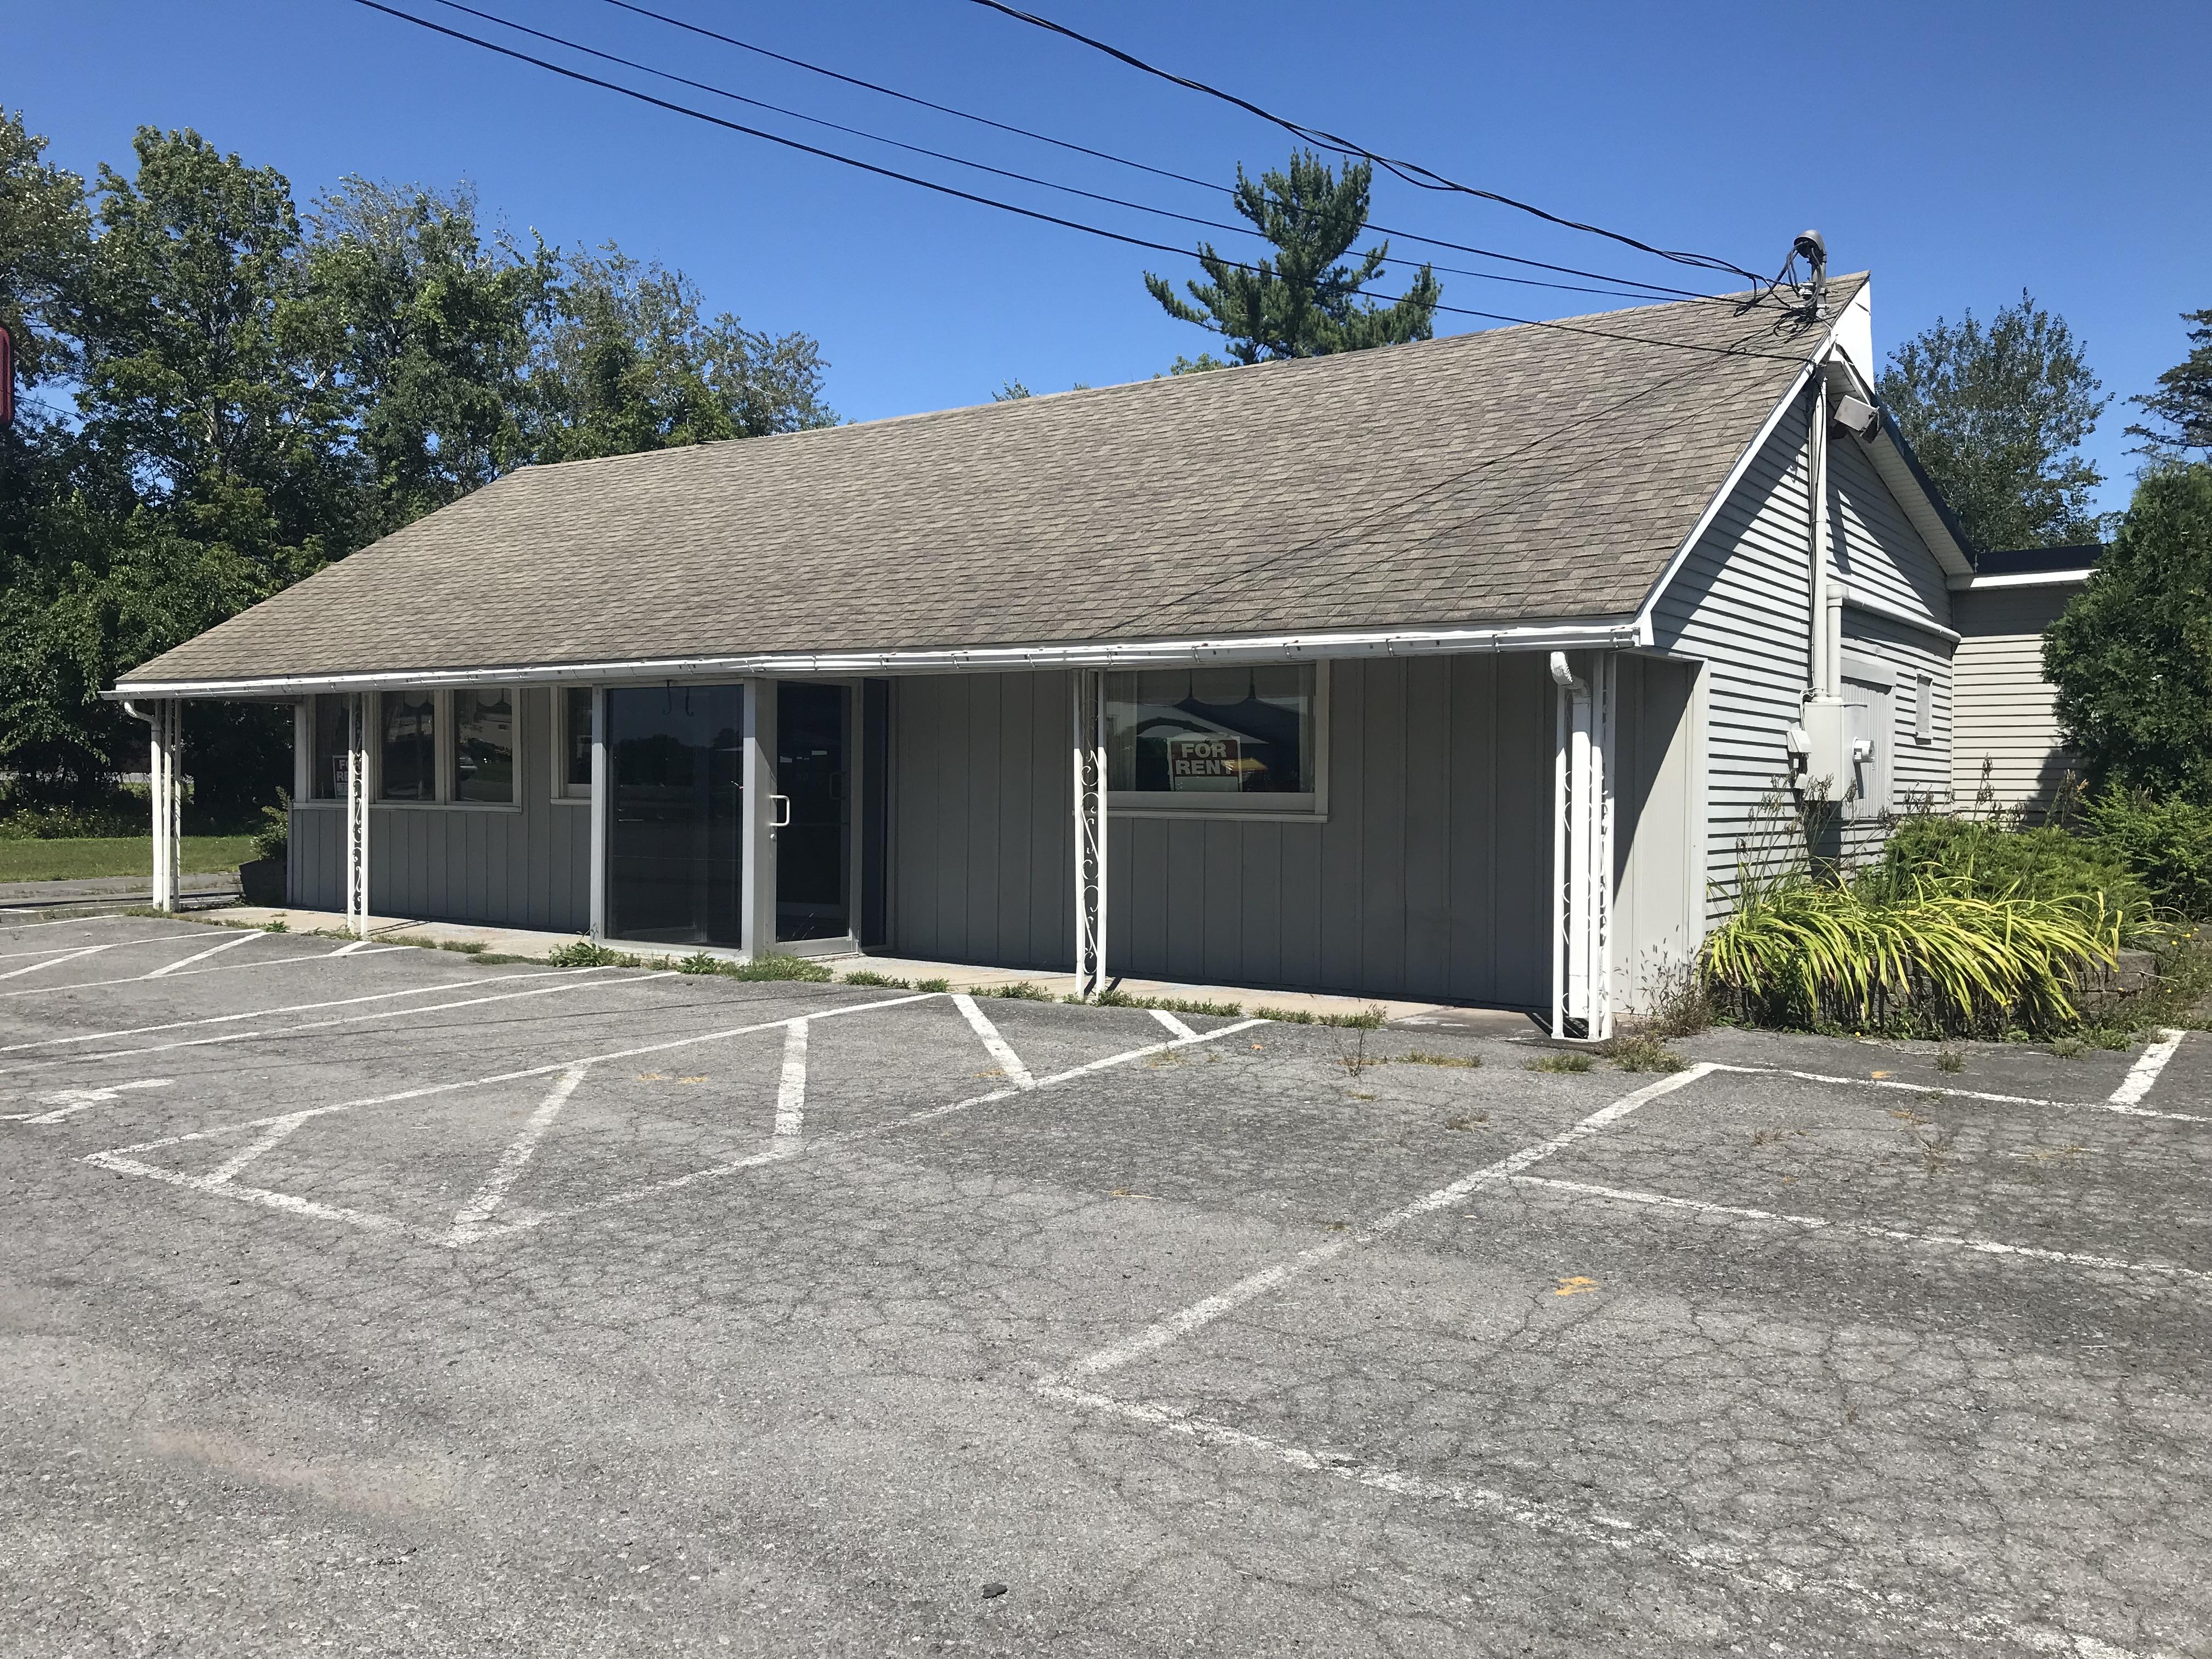 8195 Seneca Turnpike, New Hartford, New York